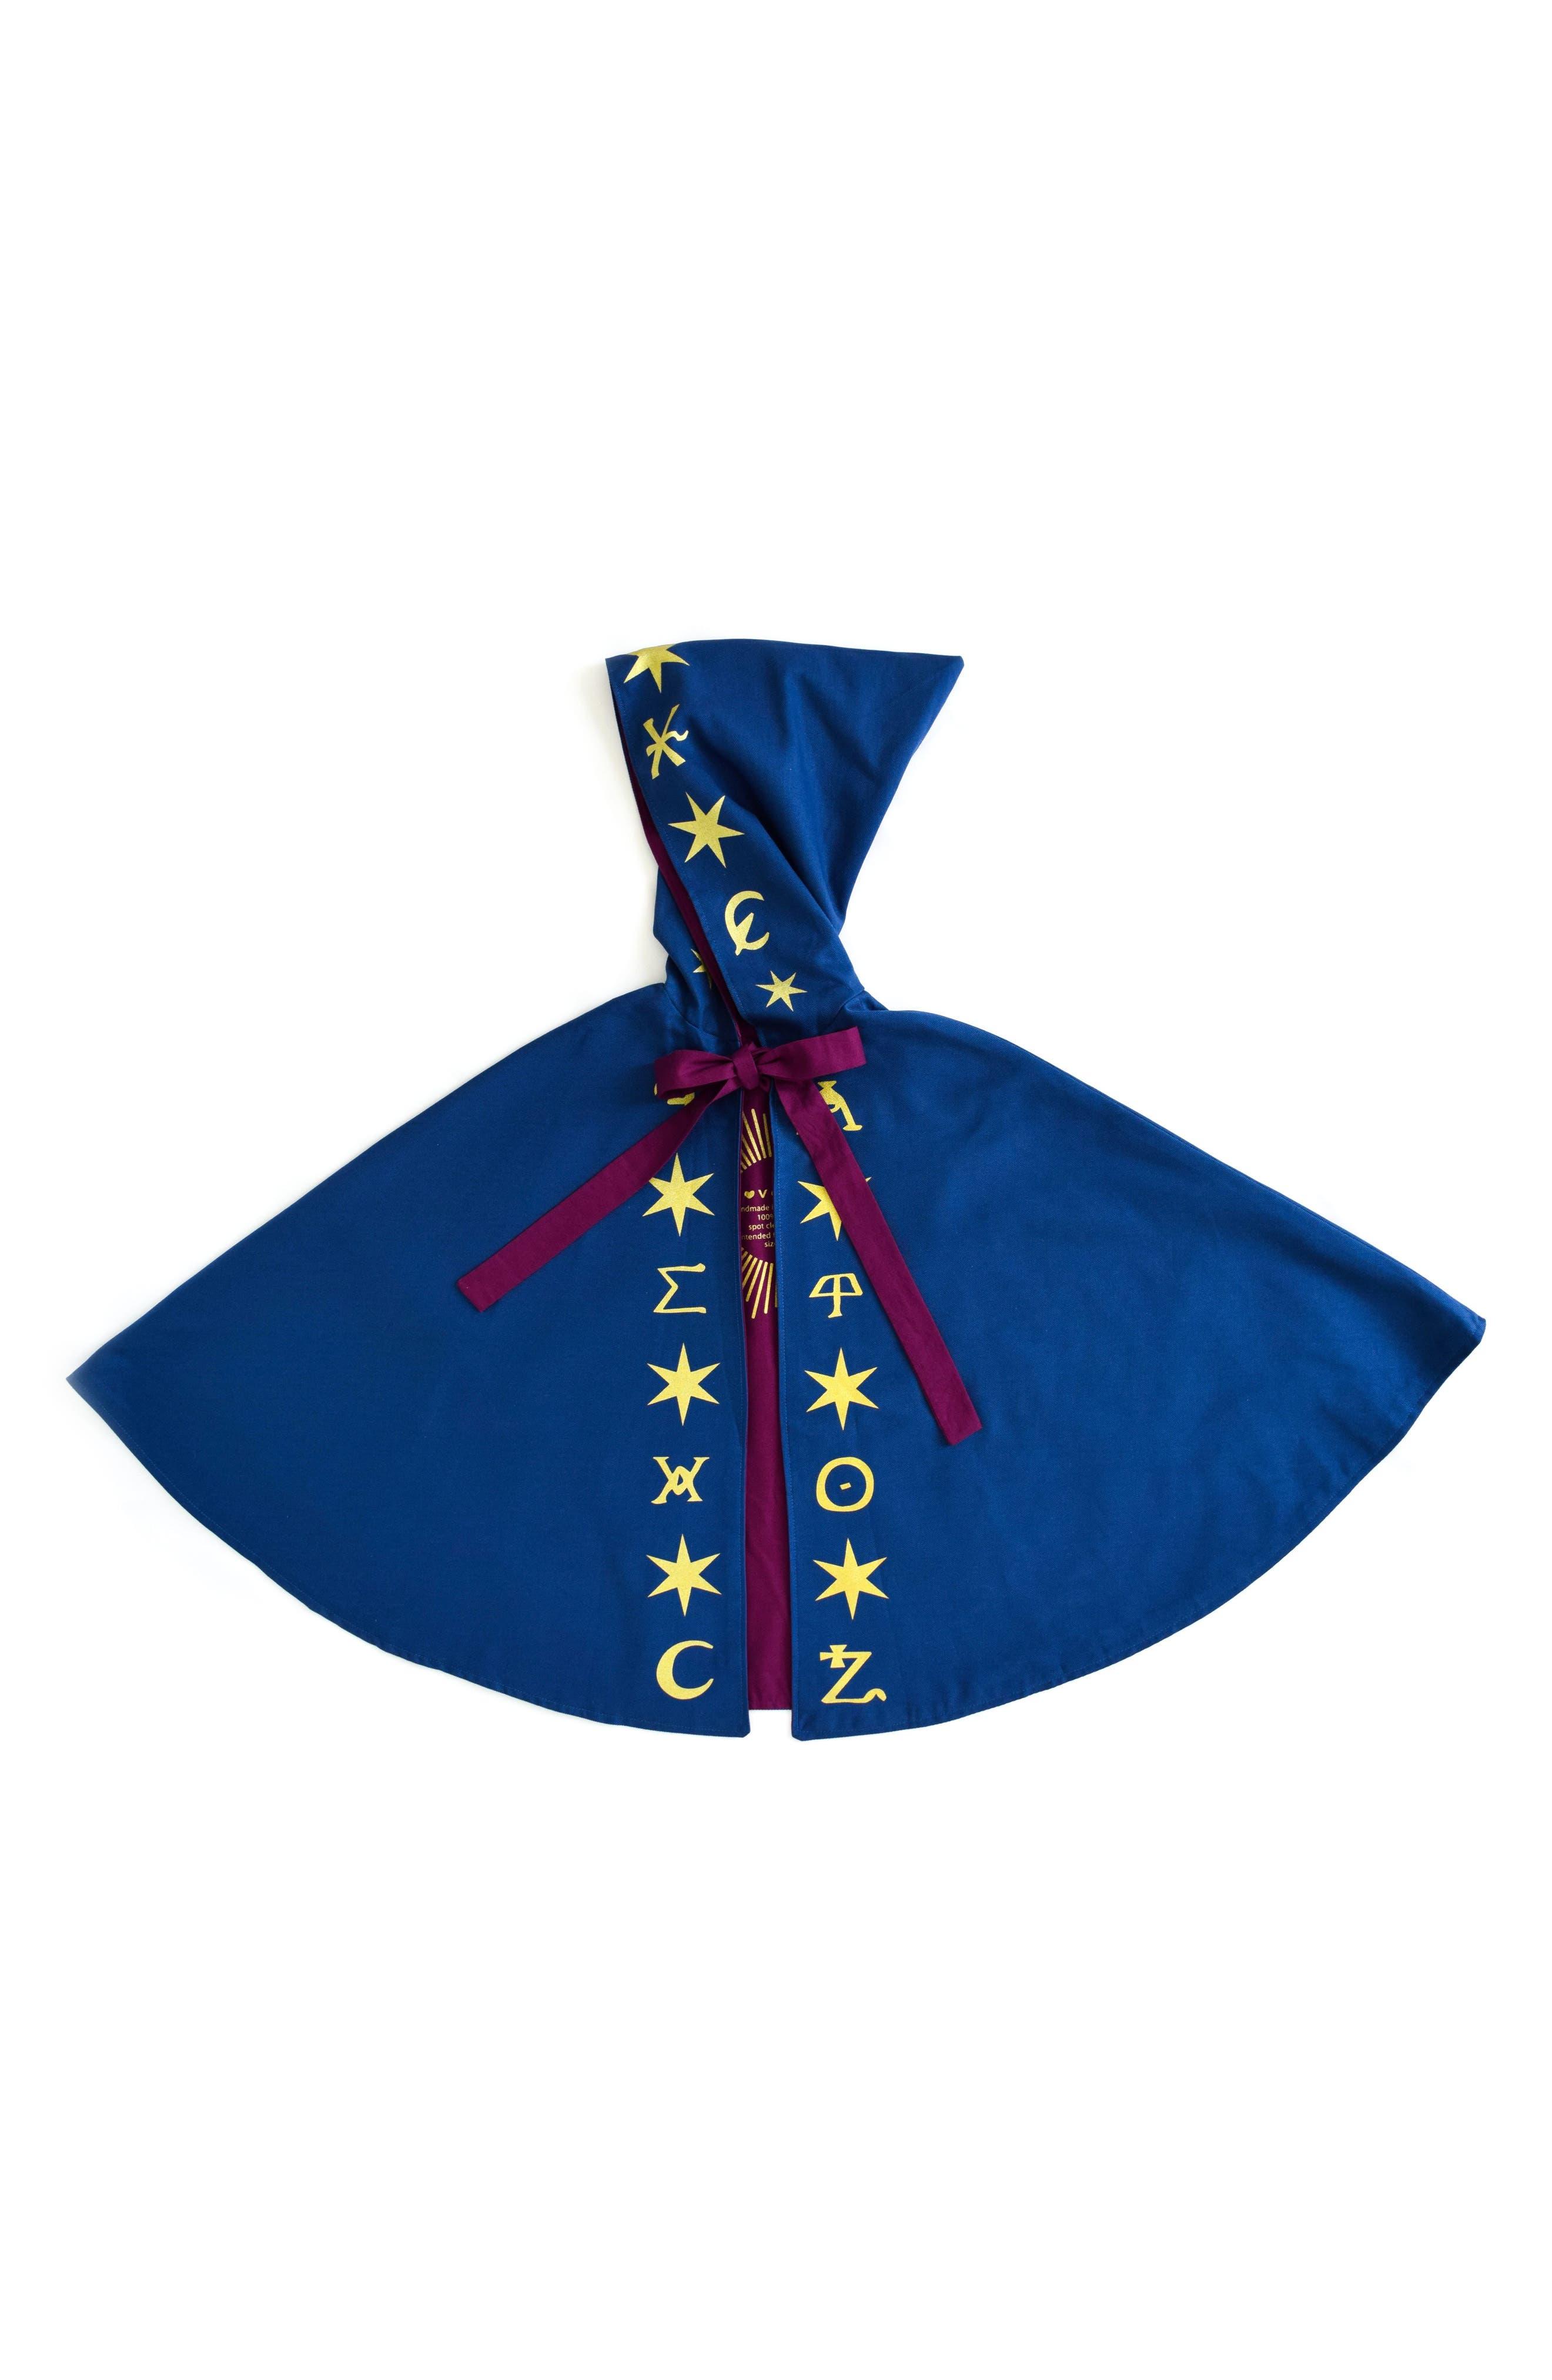 Wizard Cloak,                         Main,                         color, Navy